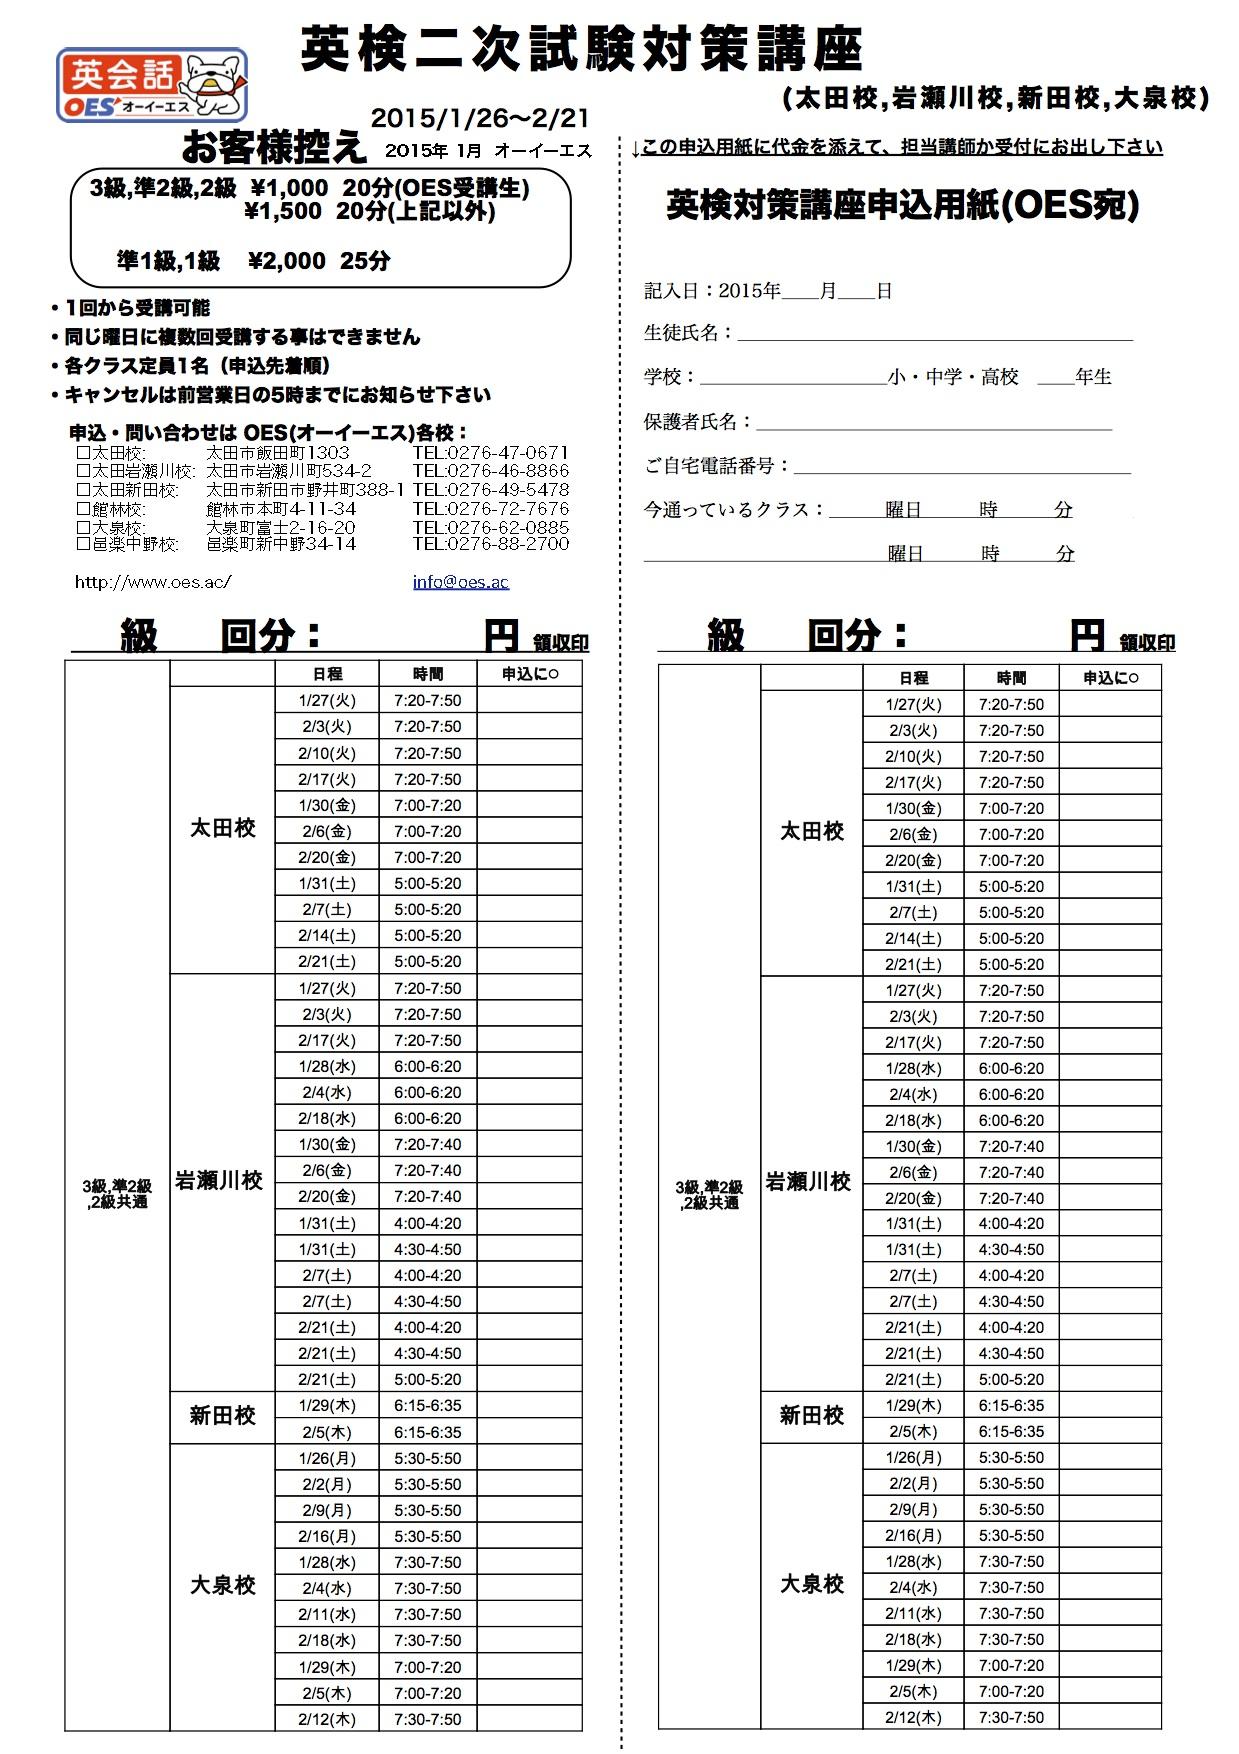 2014年度3回 英検二次試験対策講座  太田,岩瀬川,大泉 のコピー